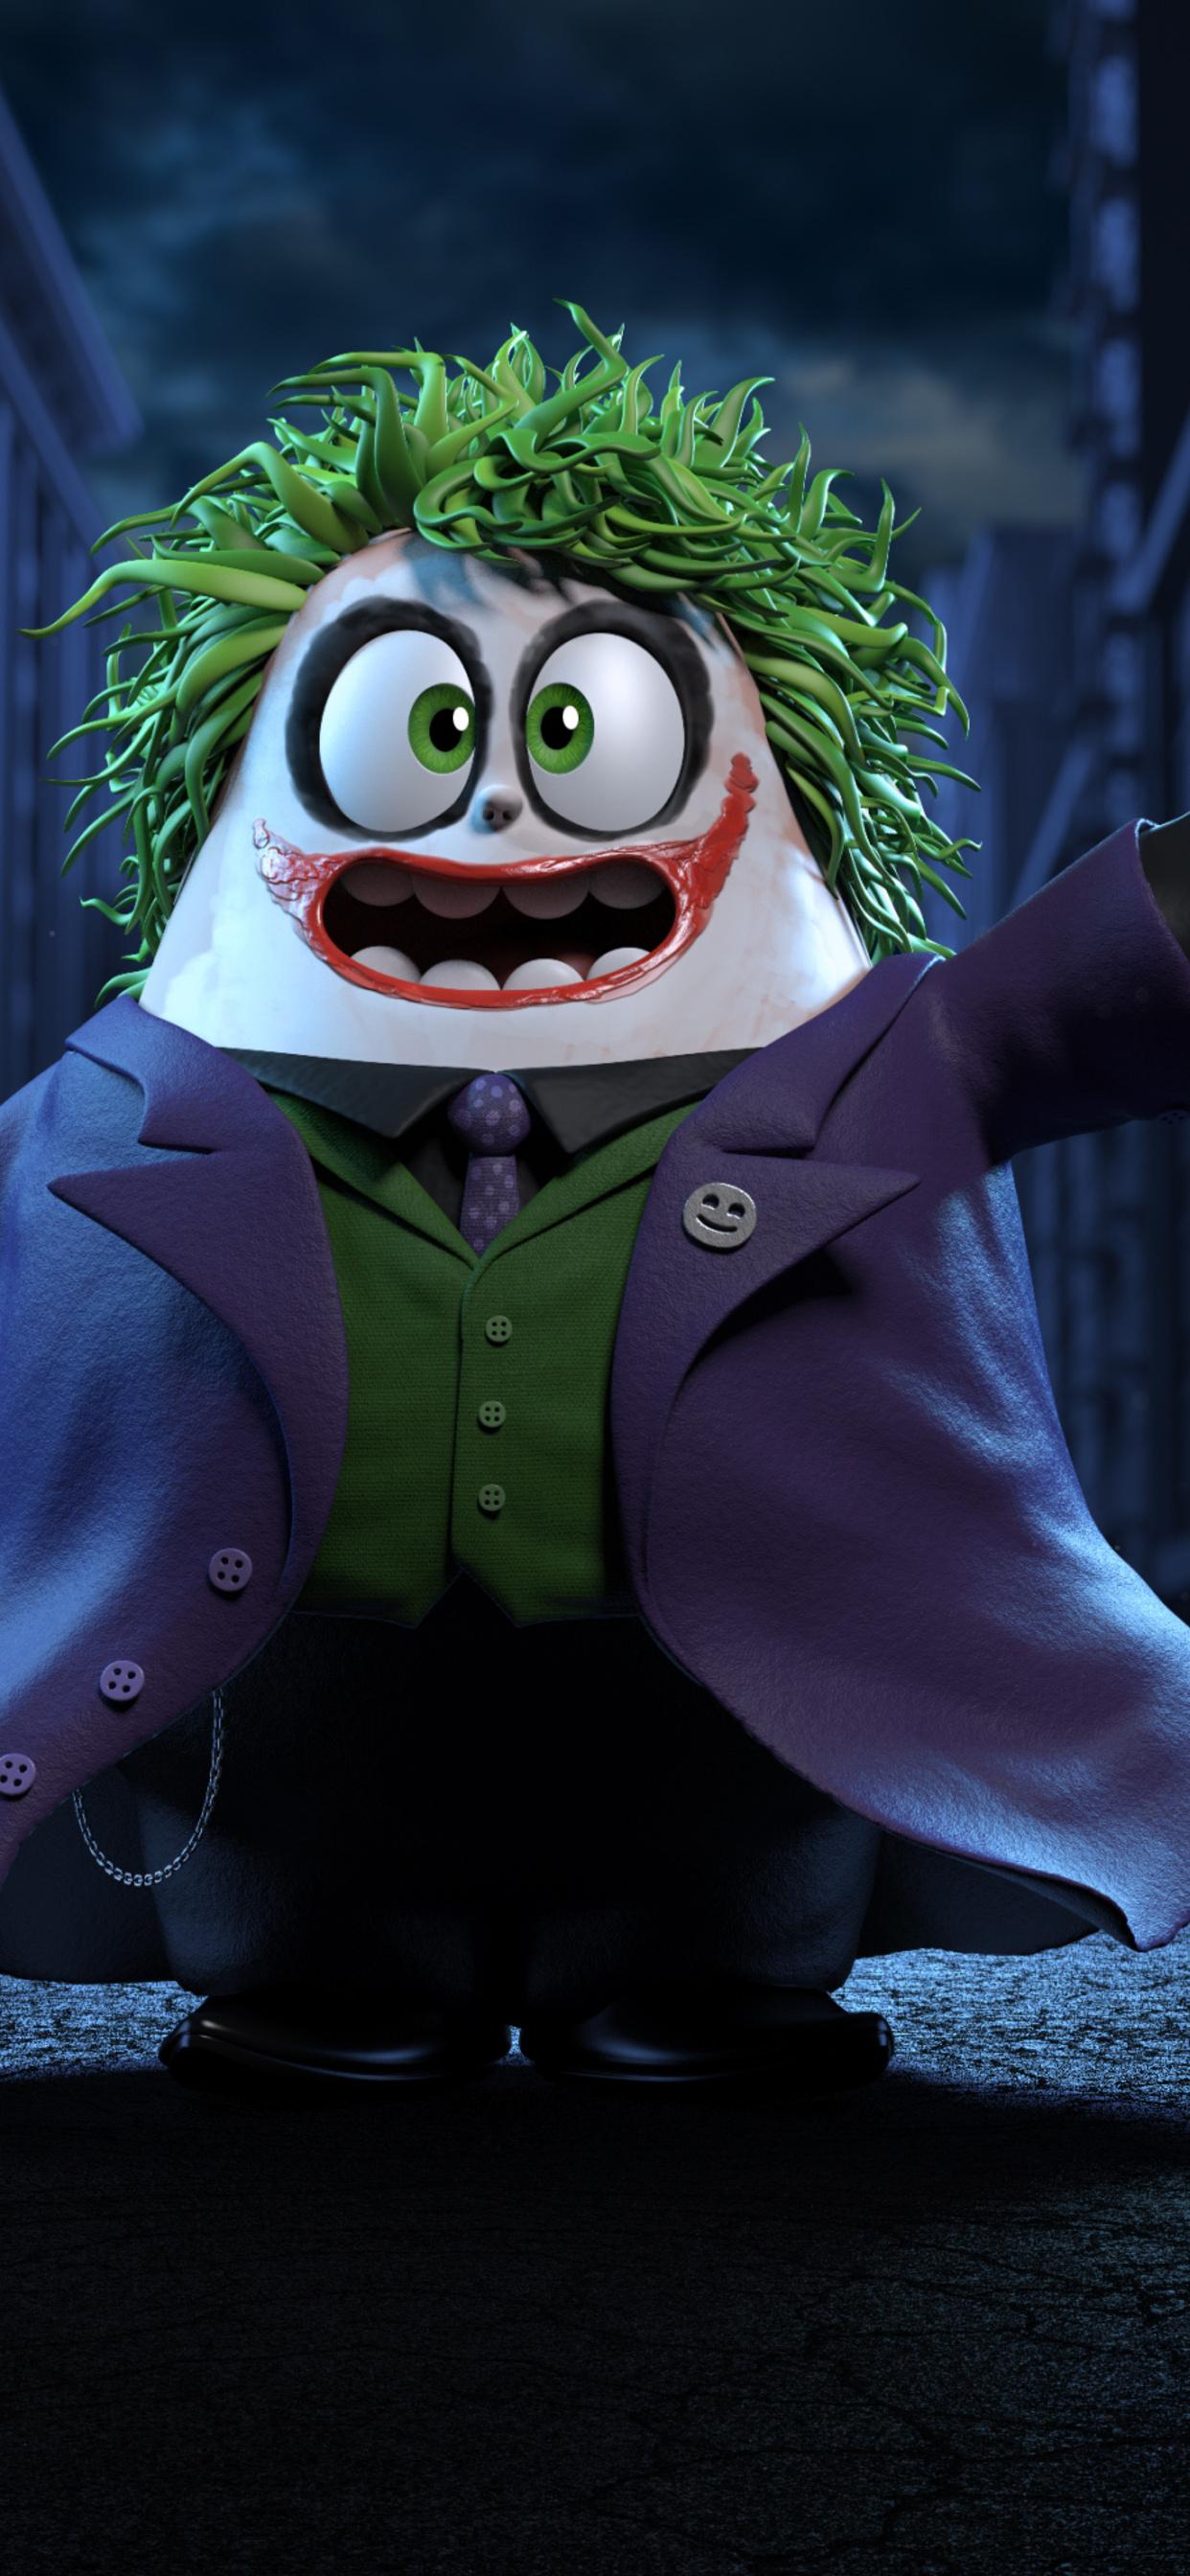 1242x2688 The Joker Fun Art Iphone Xs Max Hd 4k Wallpapers Images